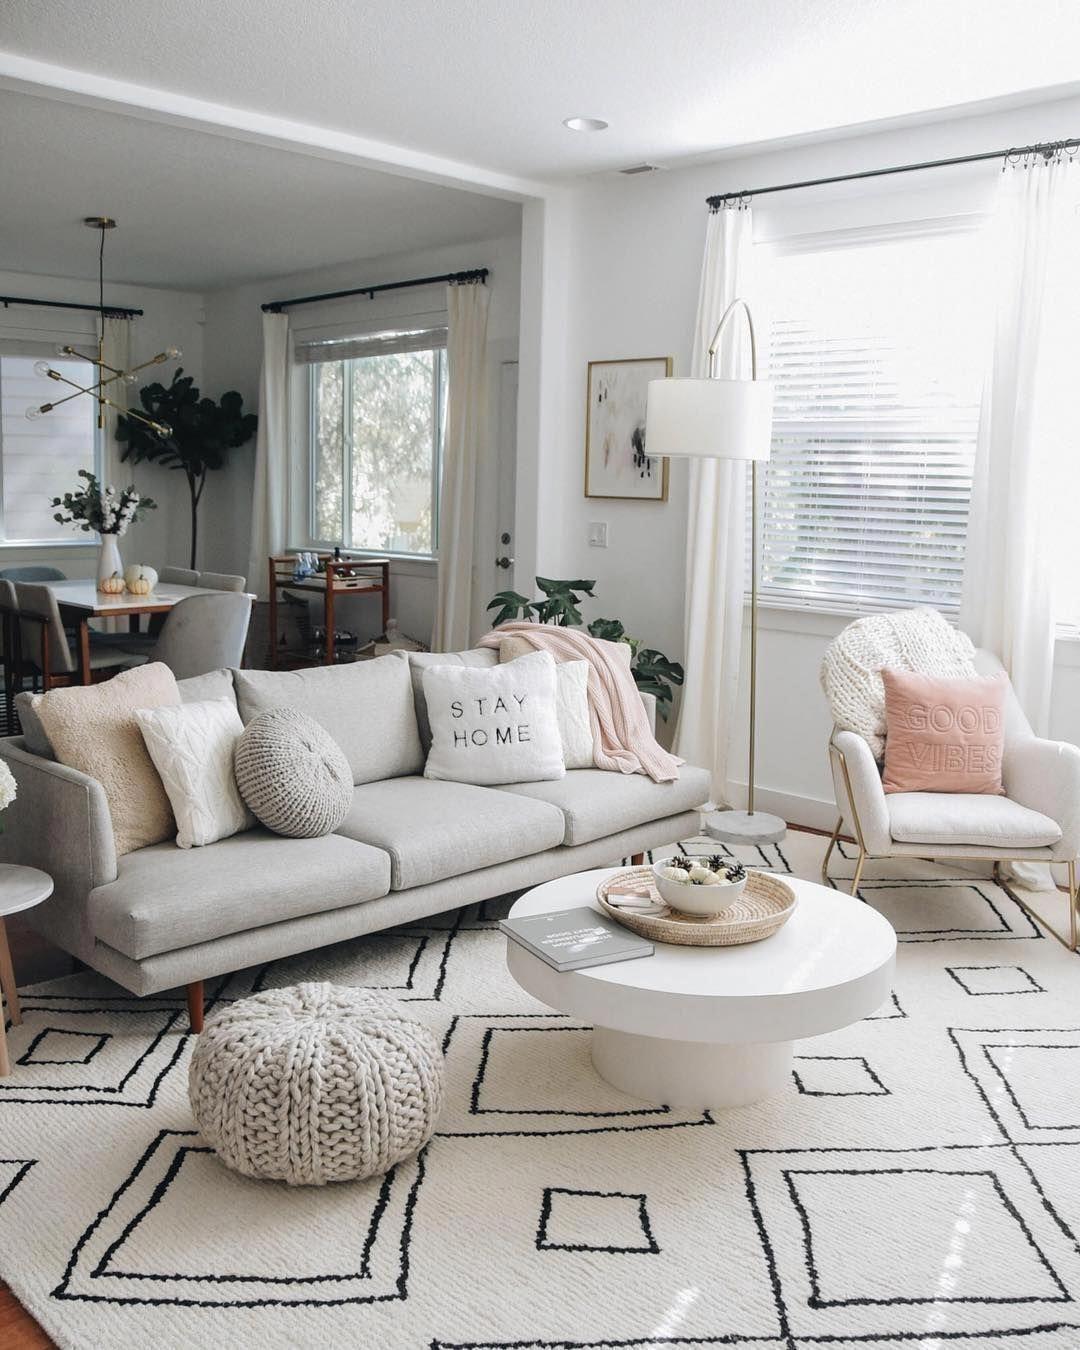 Livingroomdecor Living Room Decor Modern Living Room Designs Minimalist Living Room Idea chic living roomdecor